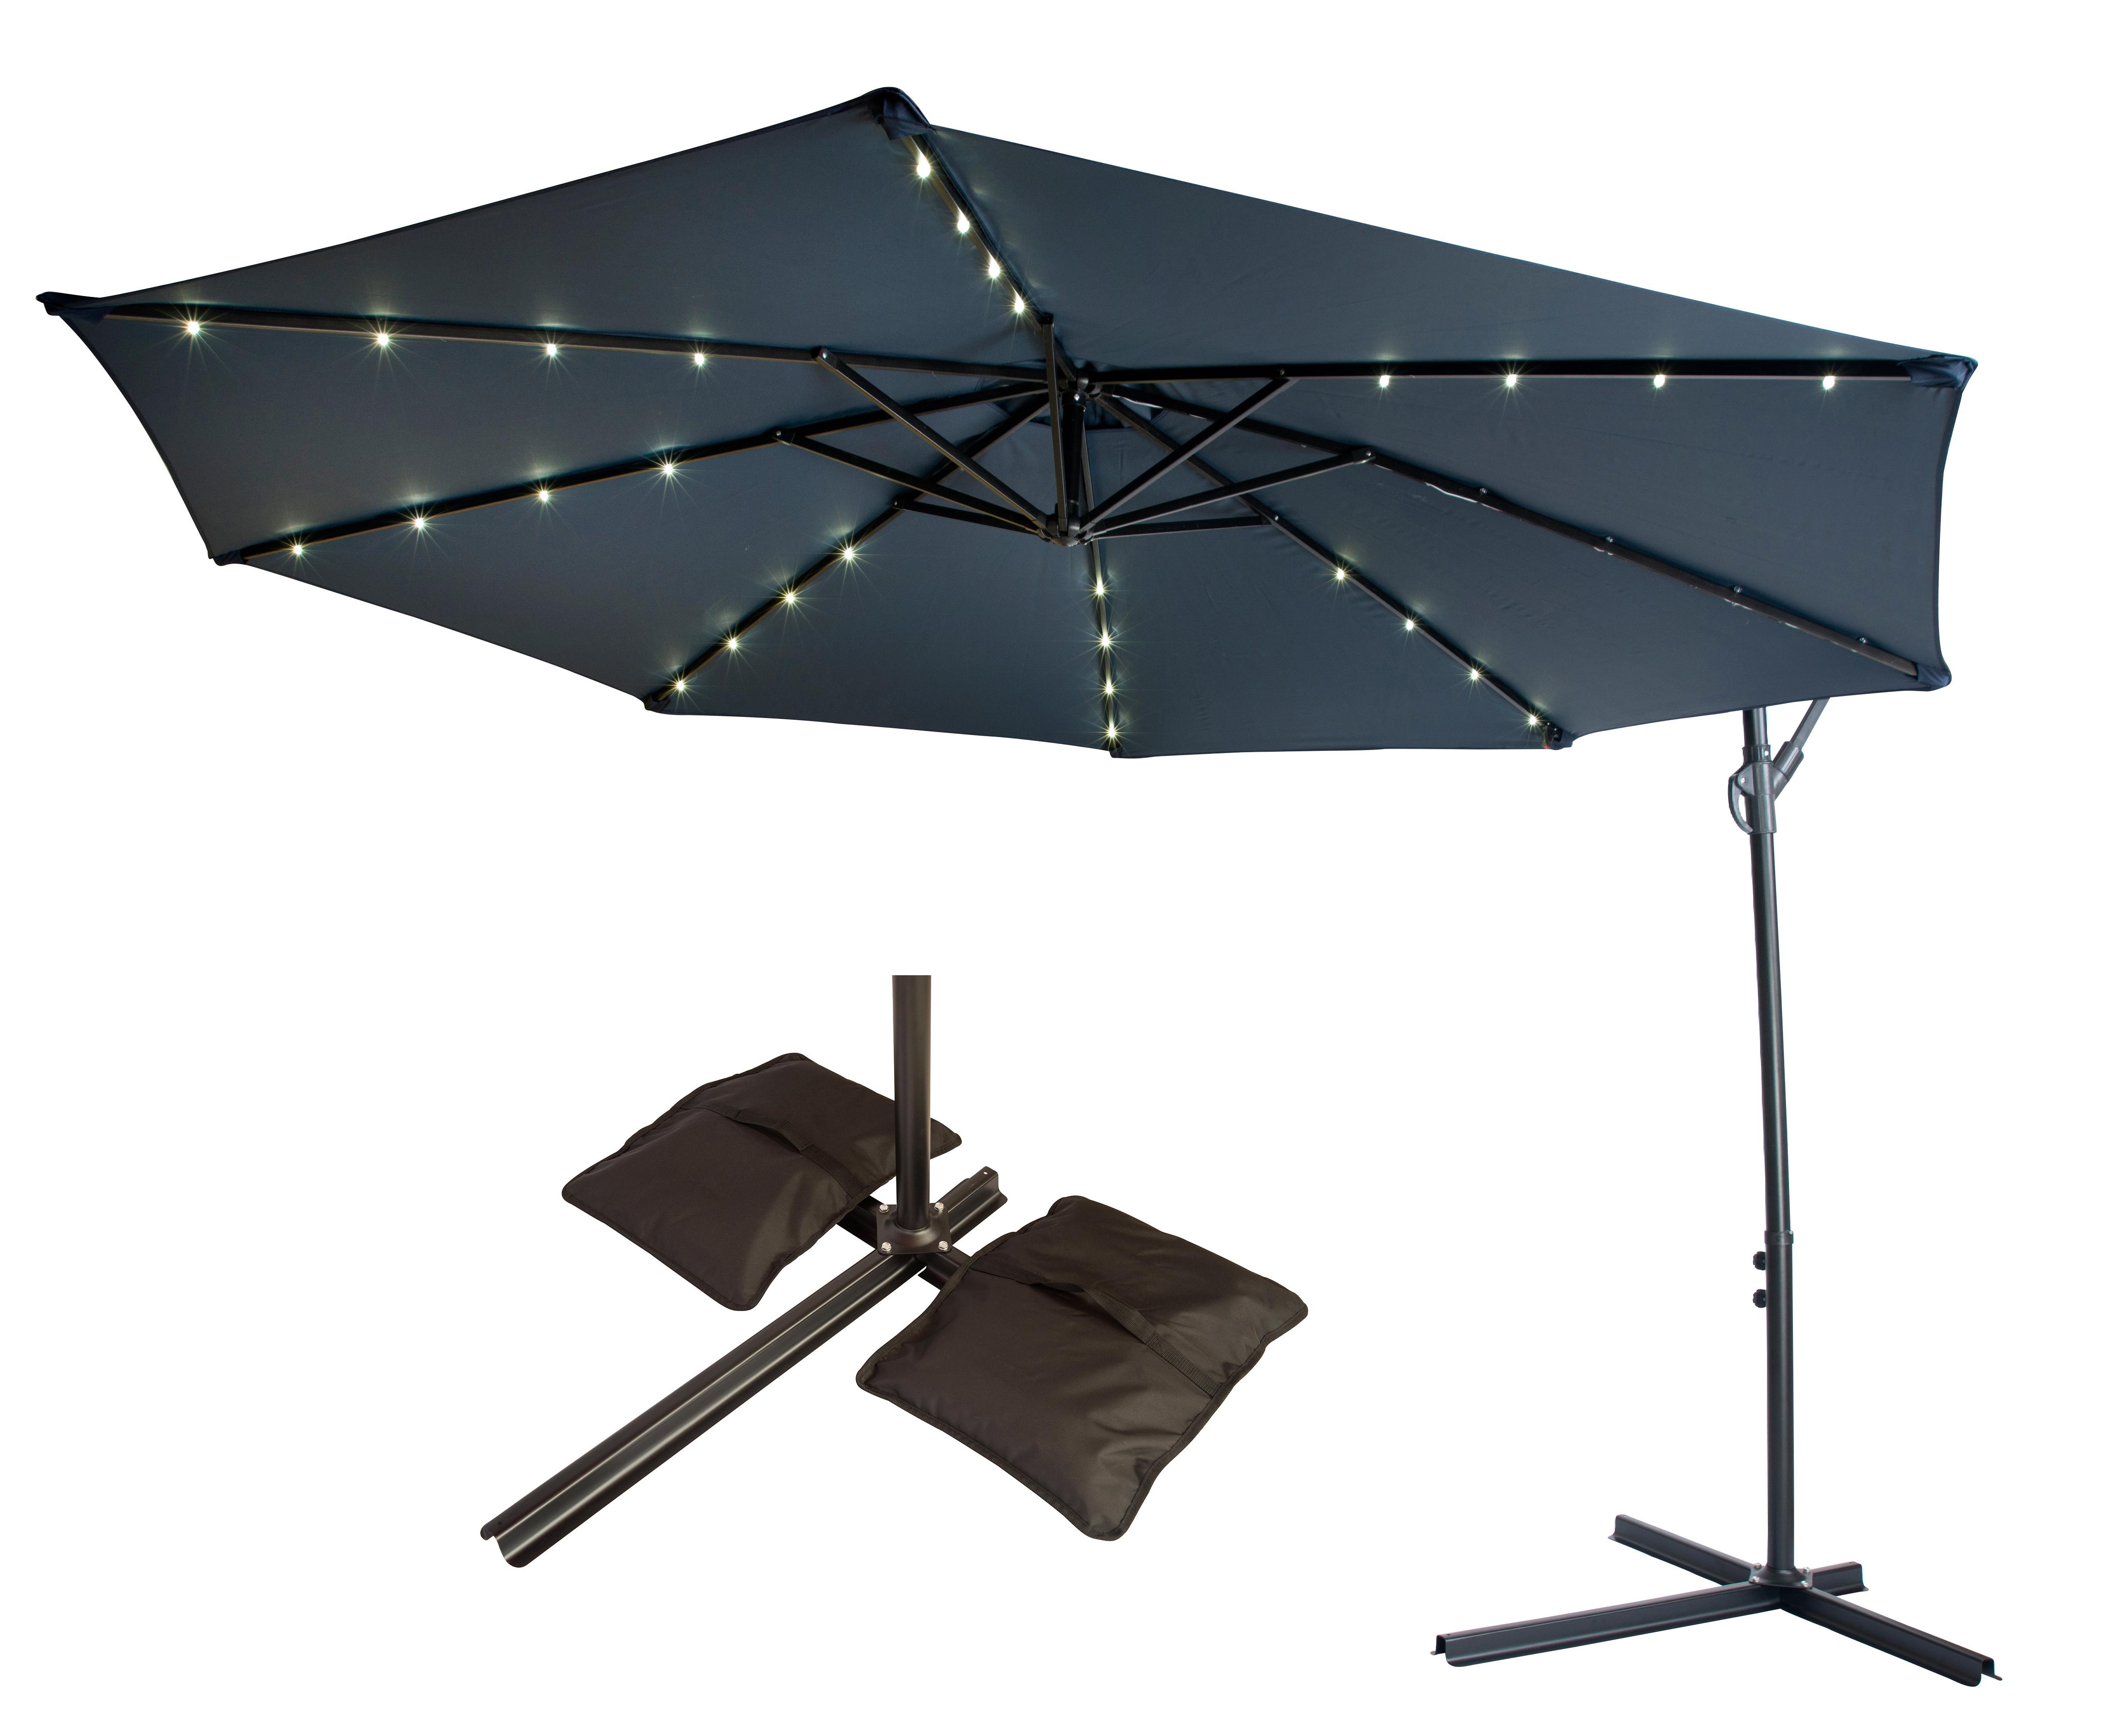 Ryant Cantilever Umbrellas Throughout 2020 10' Cantilever Umbrella (View 15 of 20)